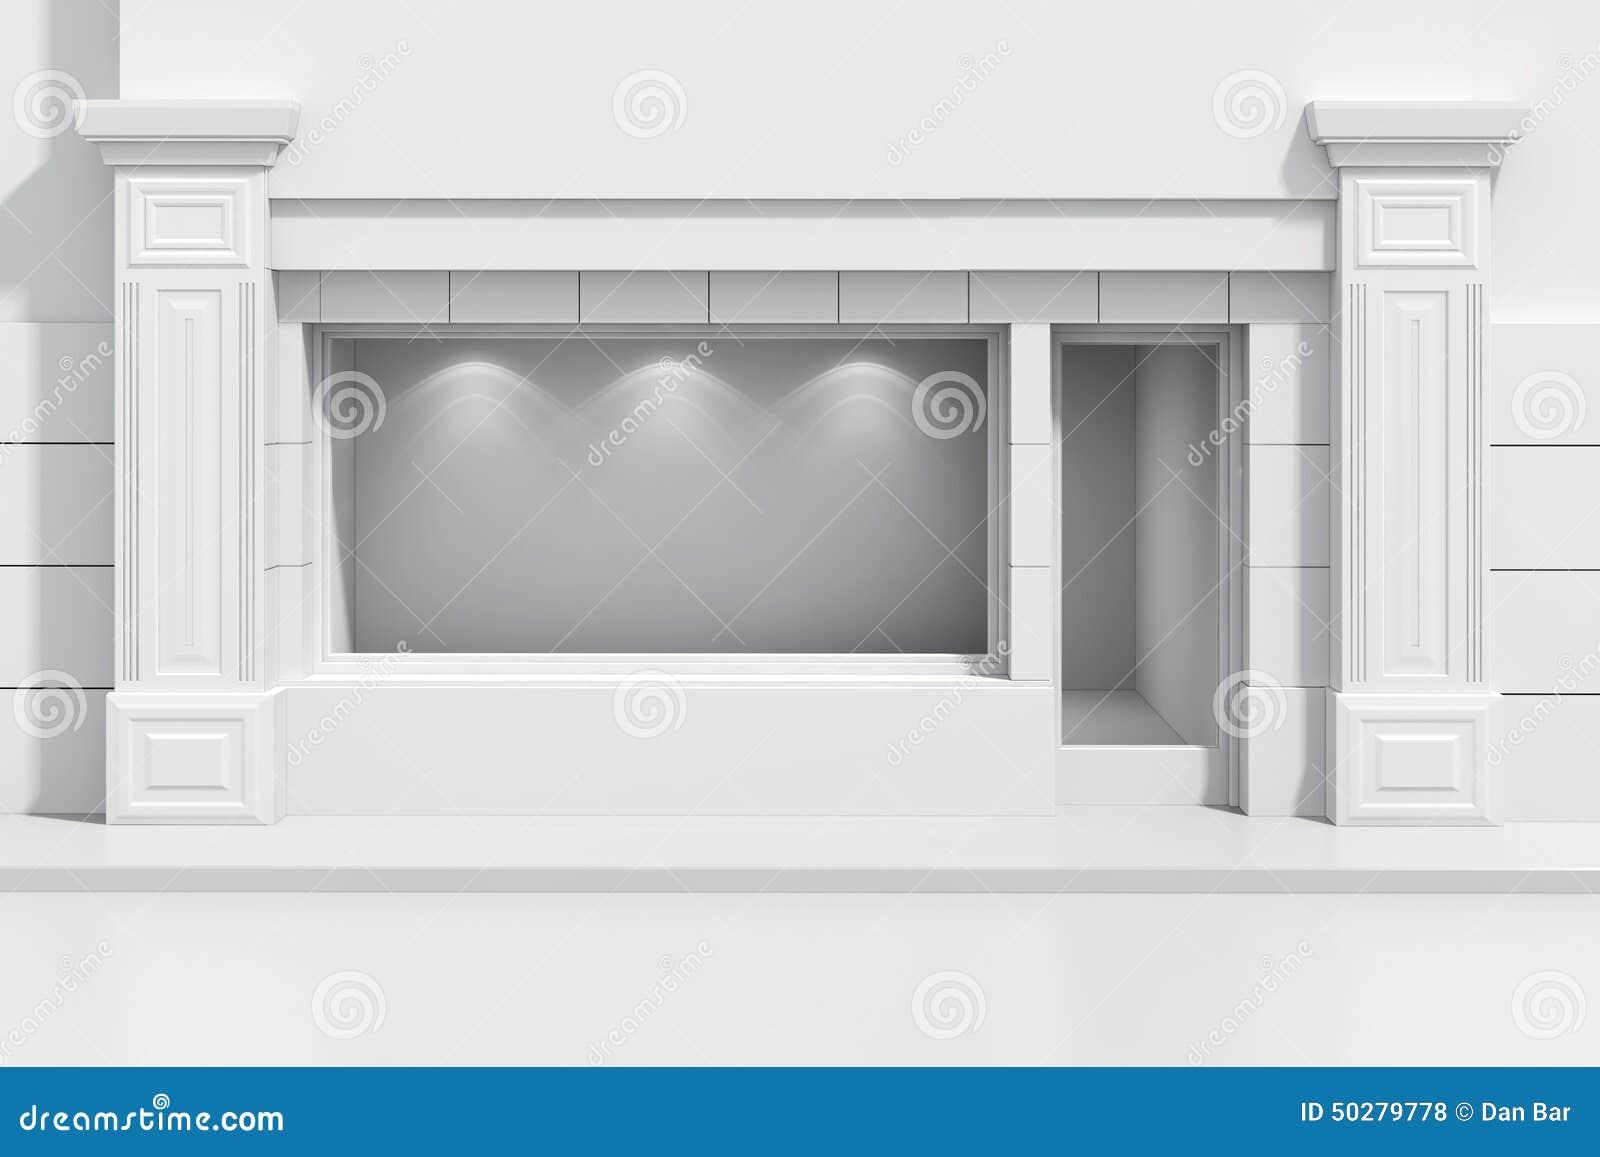 Devanture du magasin 3d illustration stock. Illustration du blanc ... 0b0f434f5505